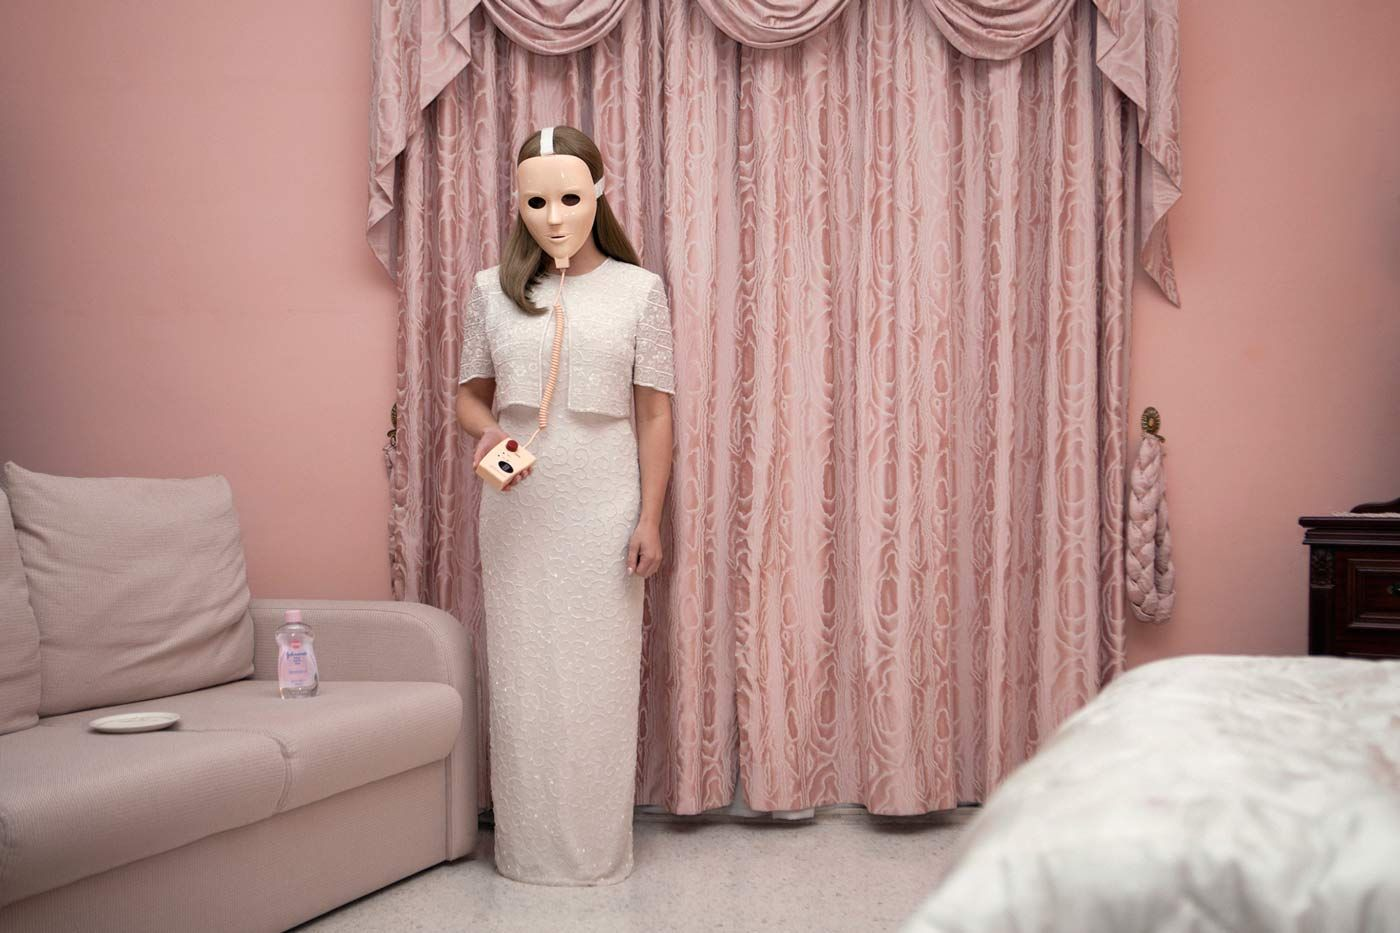 Juno Calypso Challenges Perceptions Of Female Beauty Juno Calypso Female Photographers